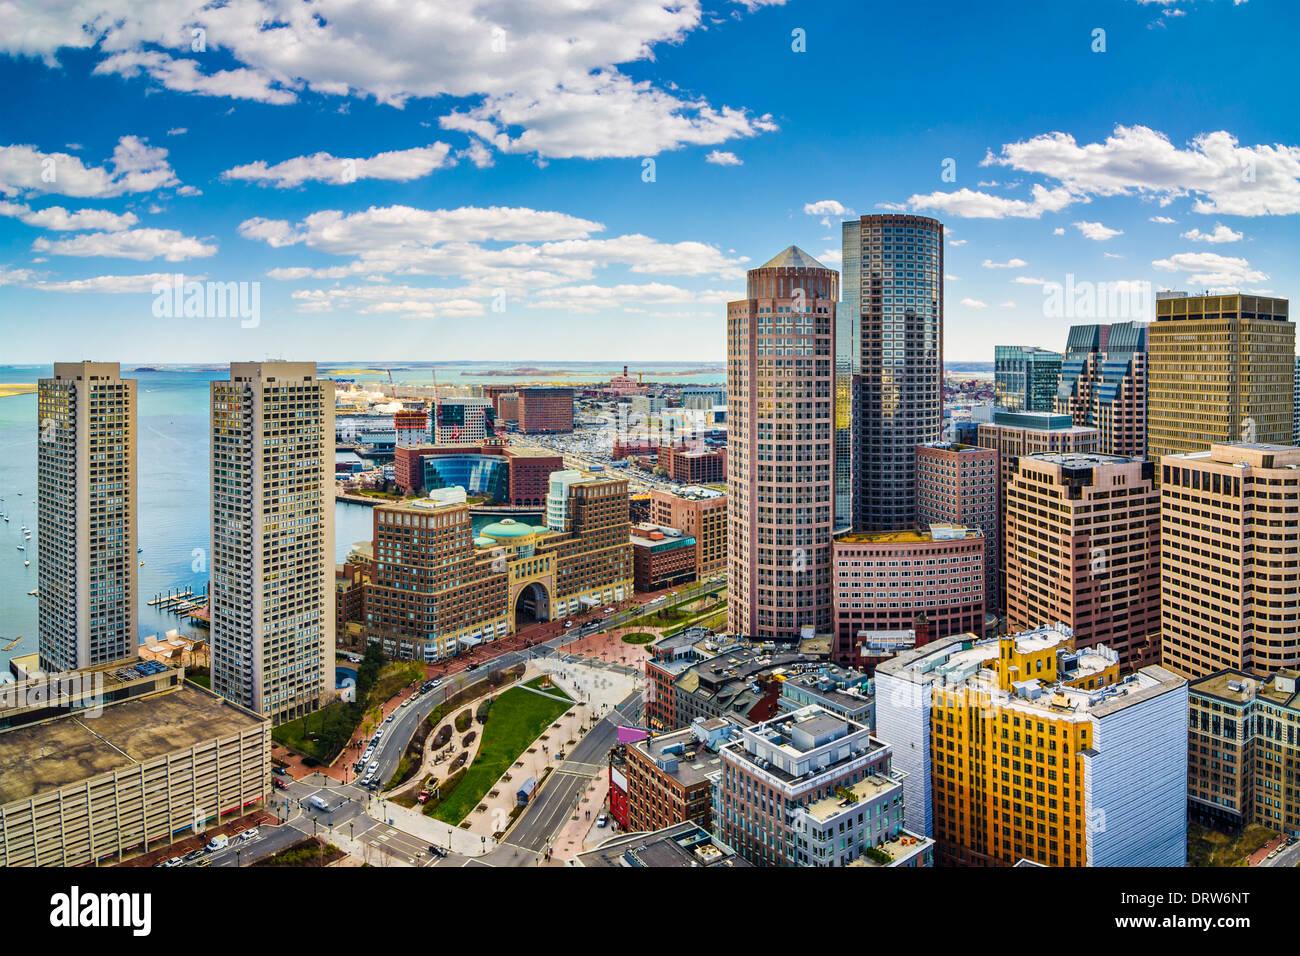 Vista aérea de Boston, Massachusetts y el horizonte Imagen De Stock